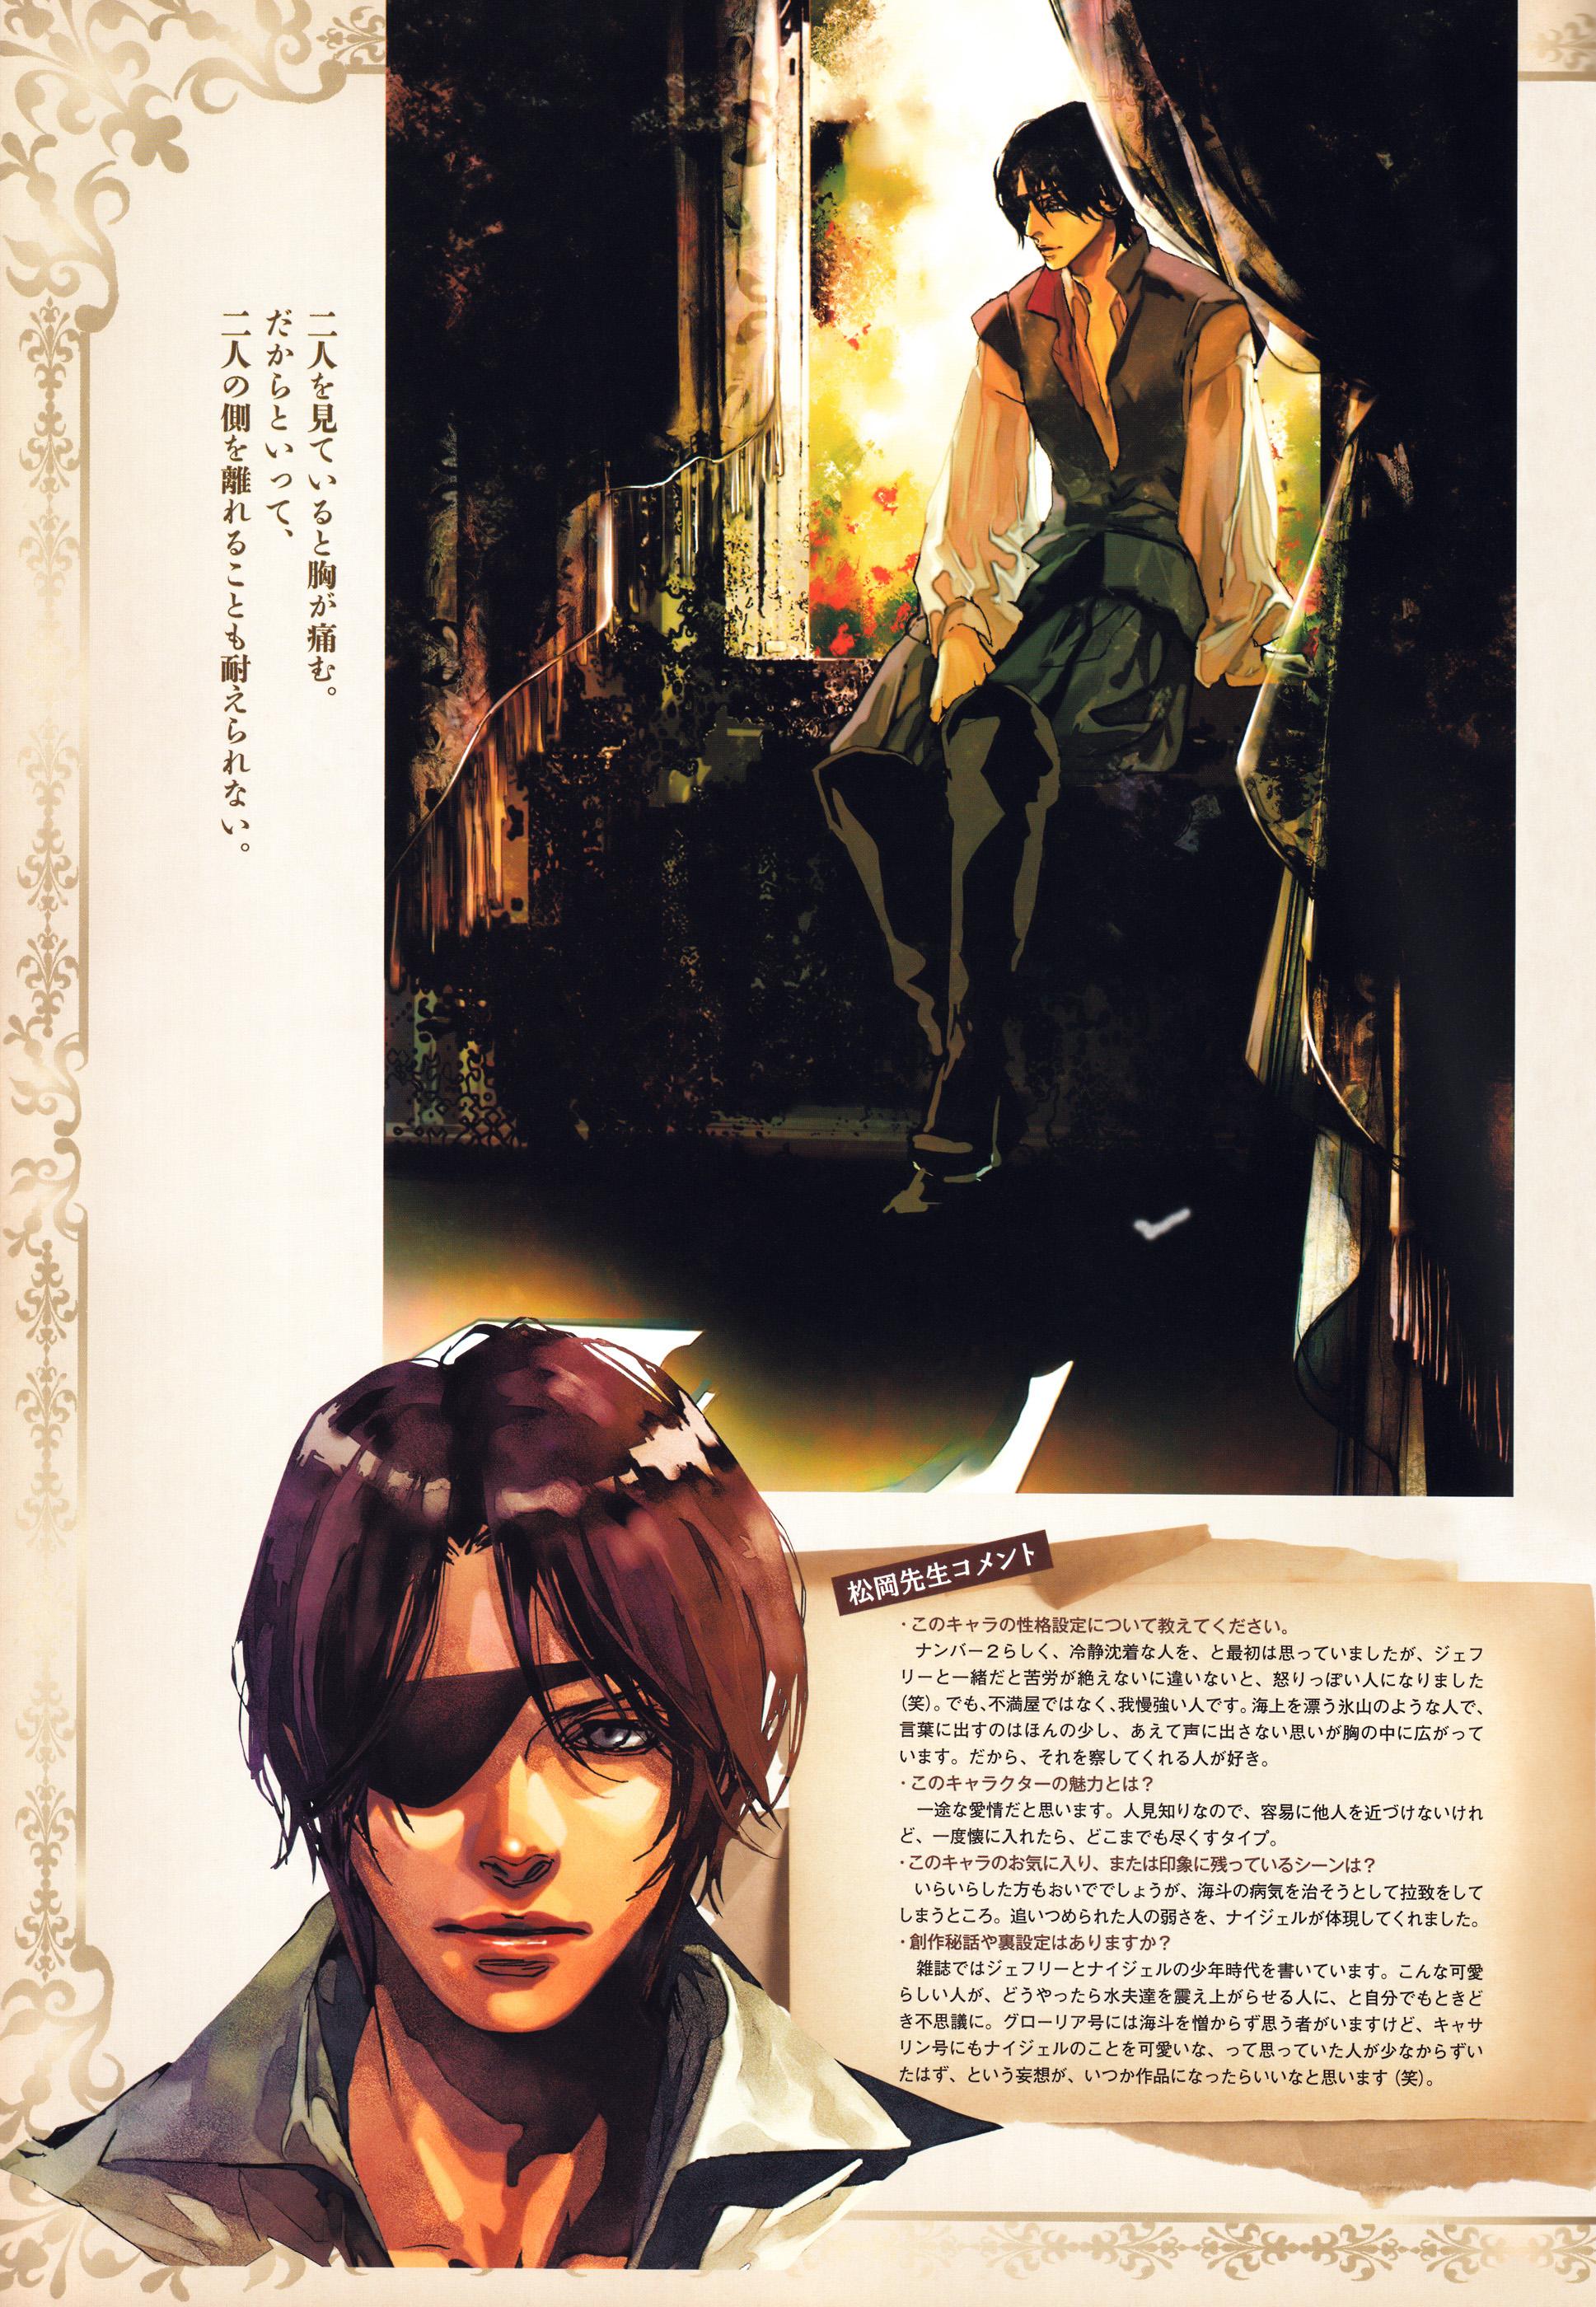 FLESH & BLOOD - Characters (6)